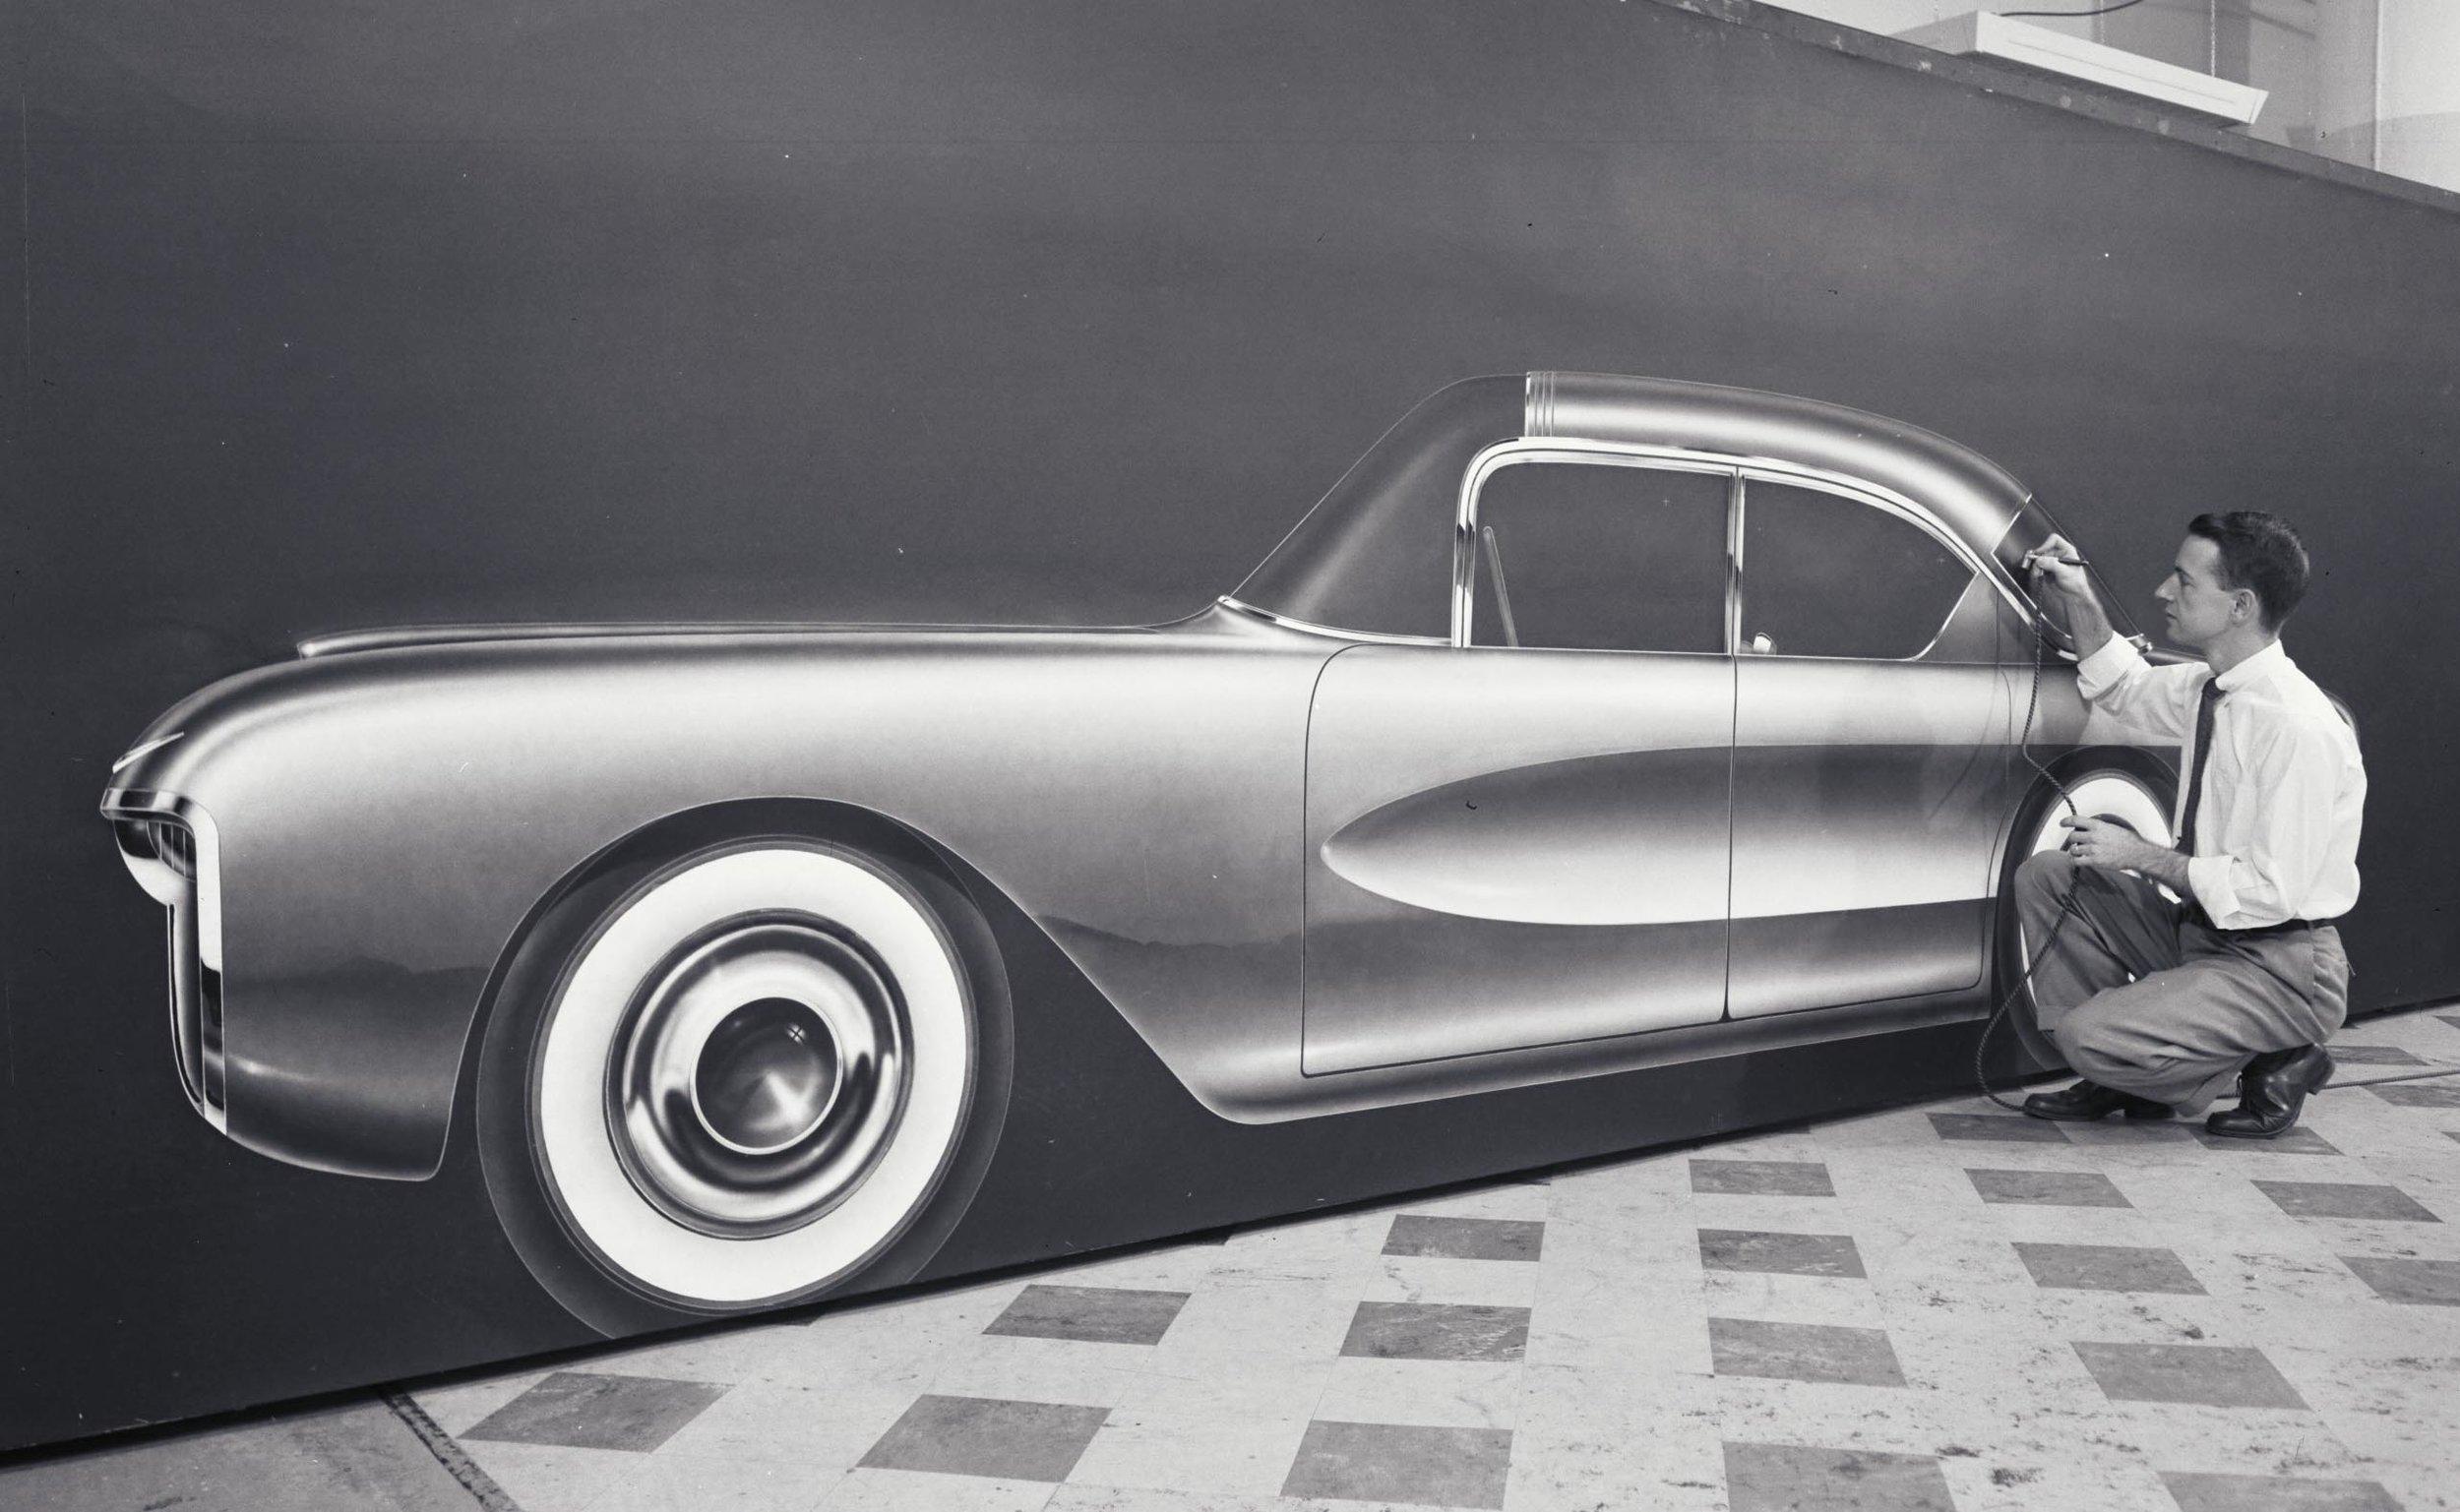 55 Chevy Biscayne Full Size Rendering.jpg